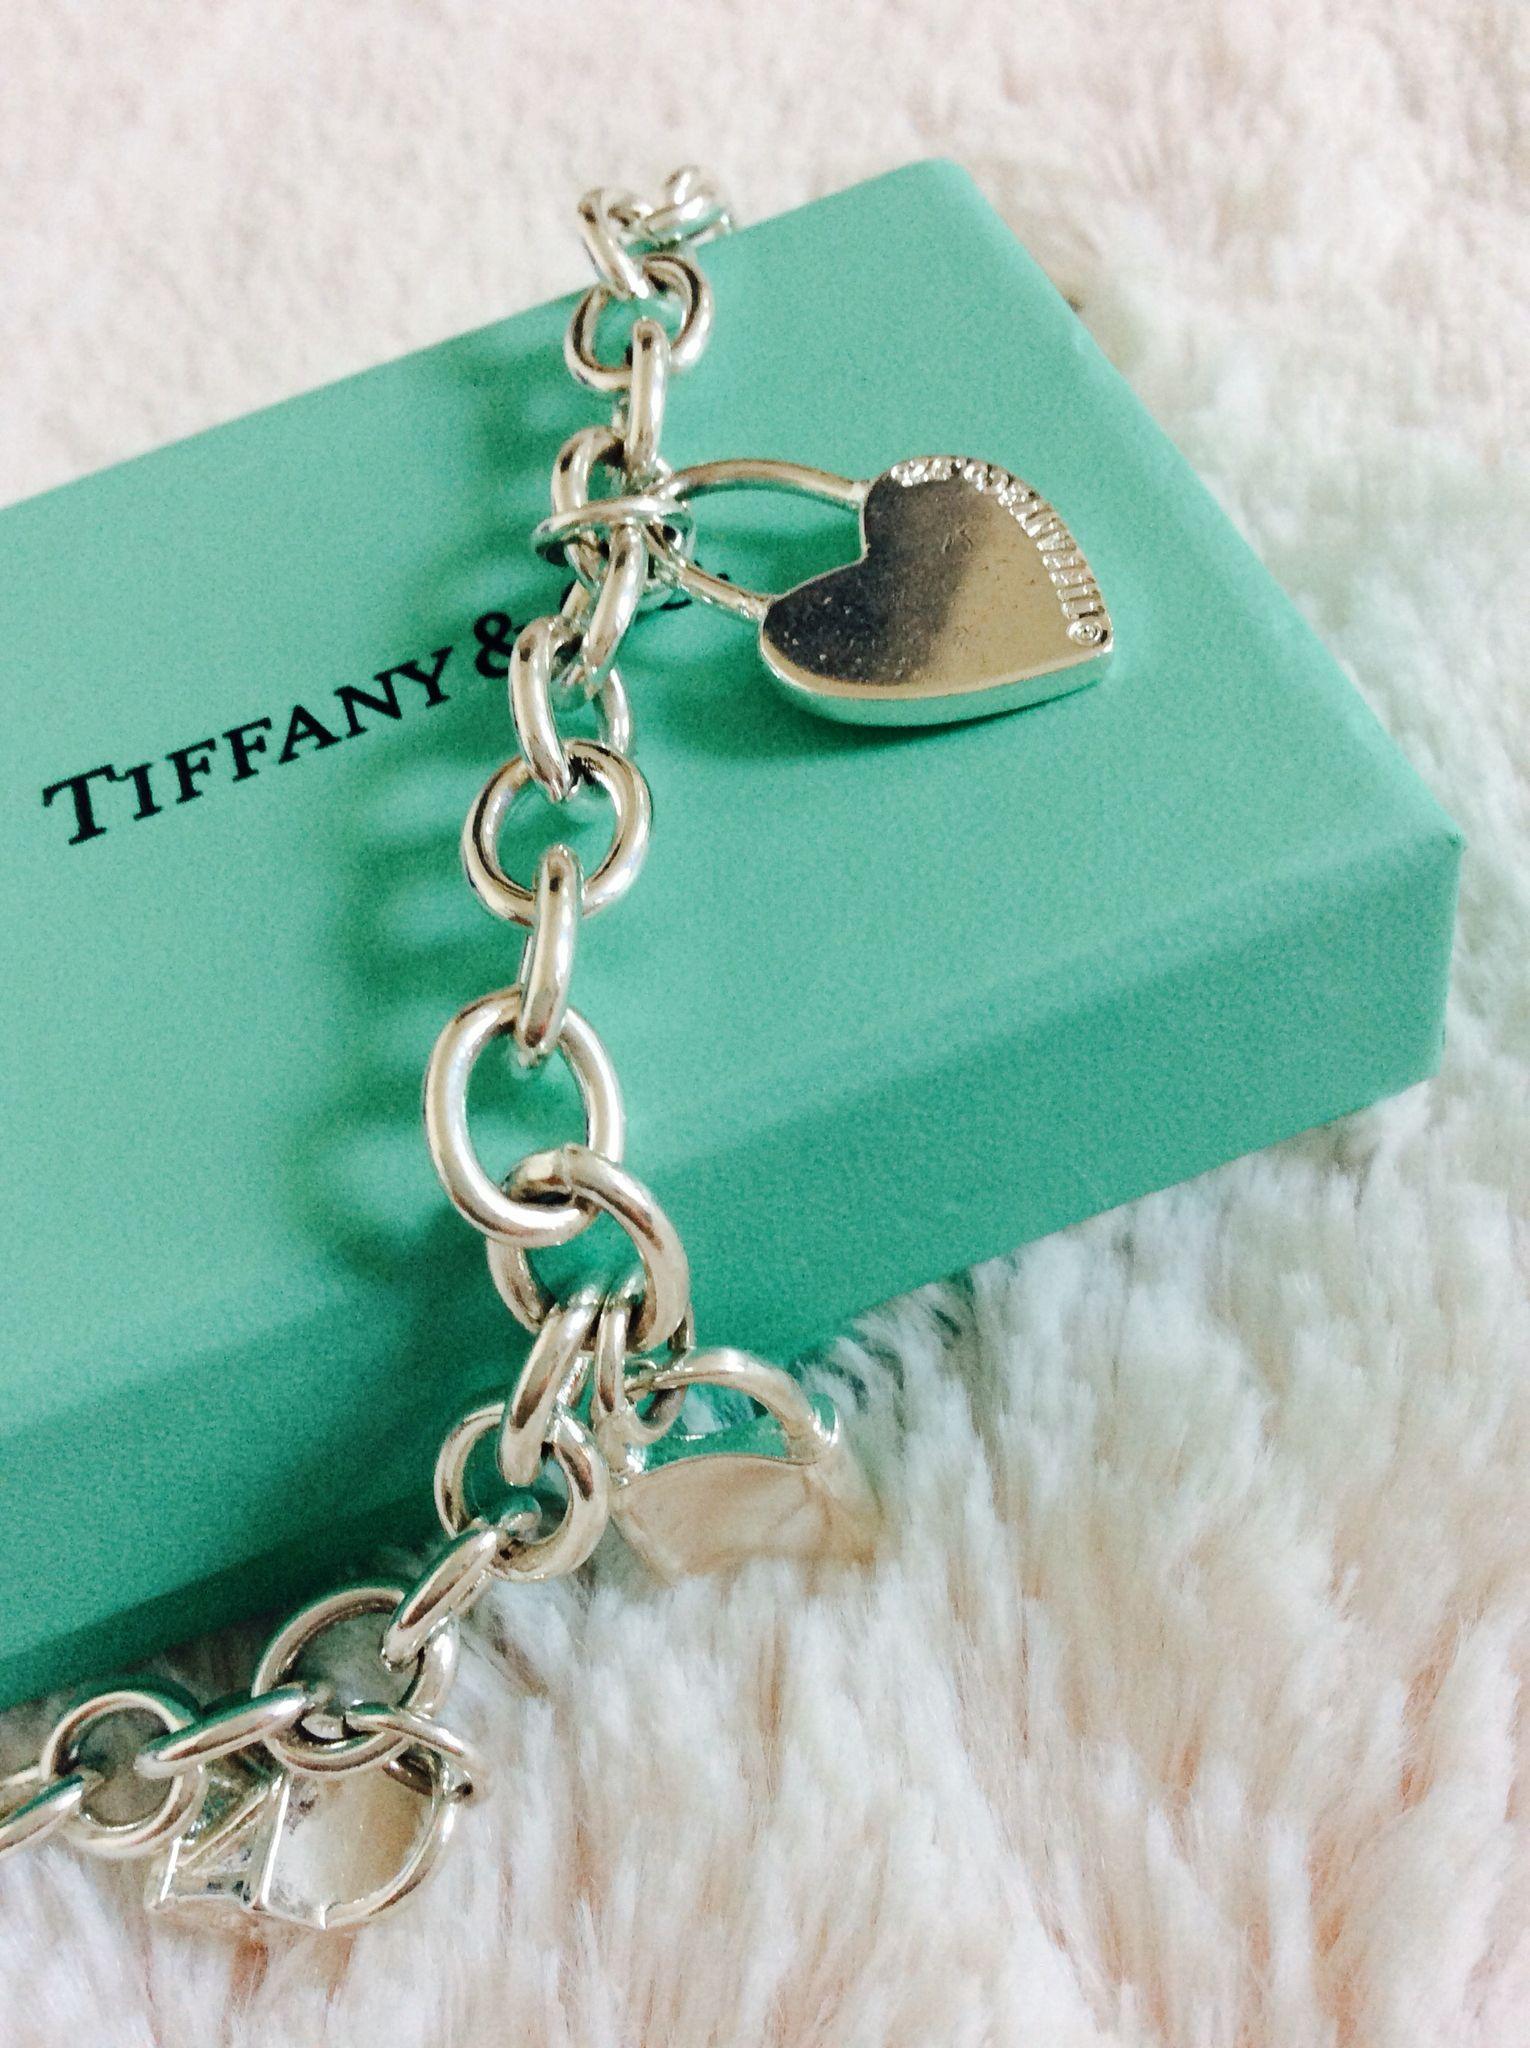 Tiffany Charm Bracelet Xoxo